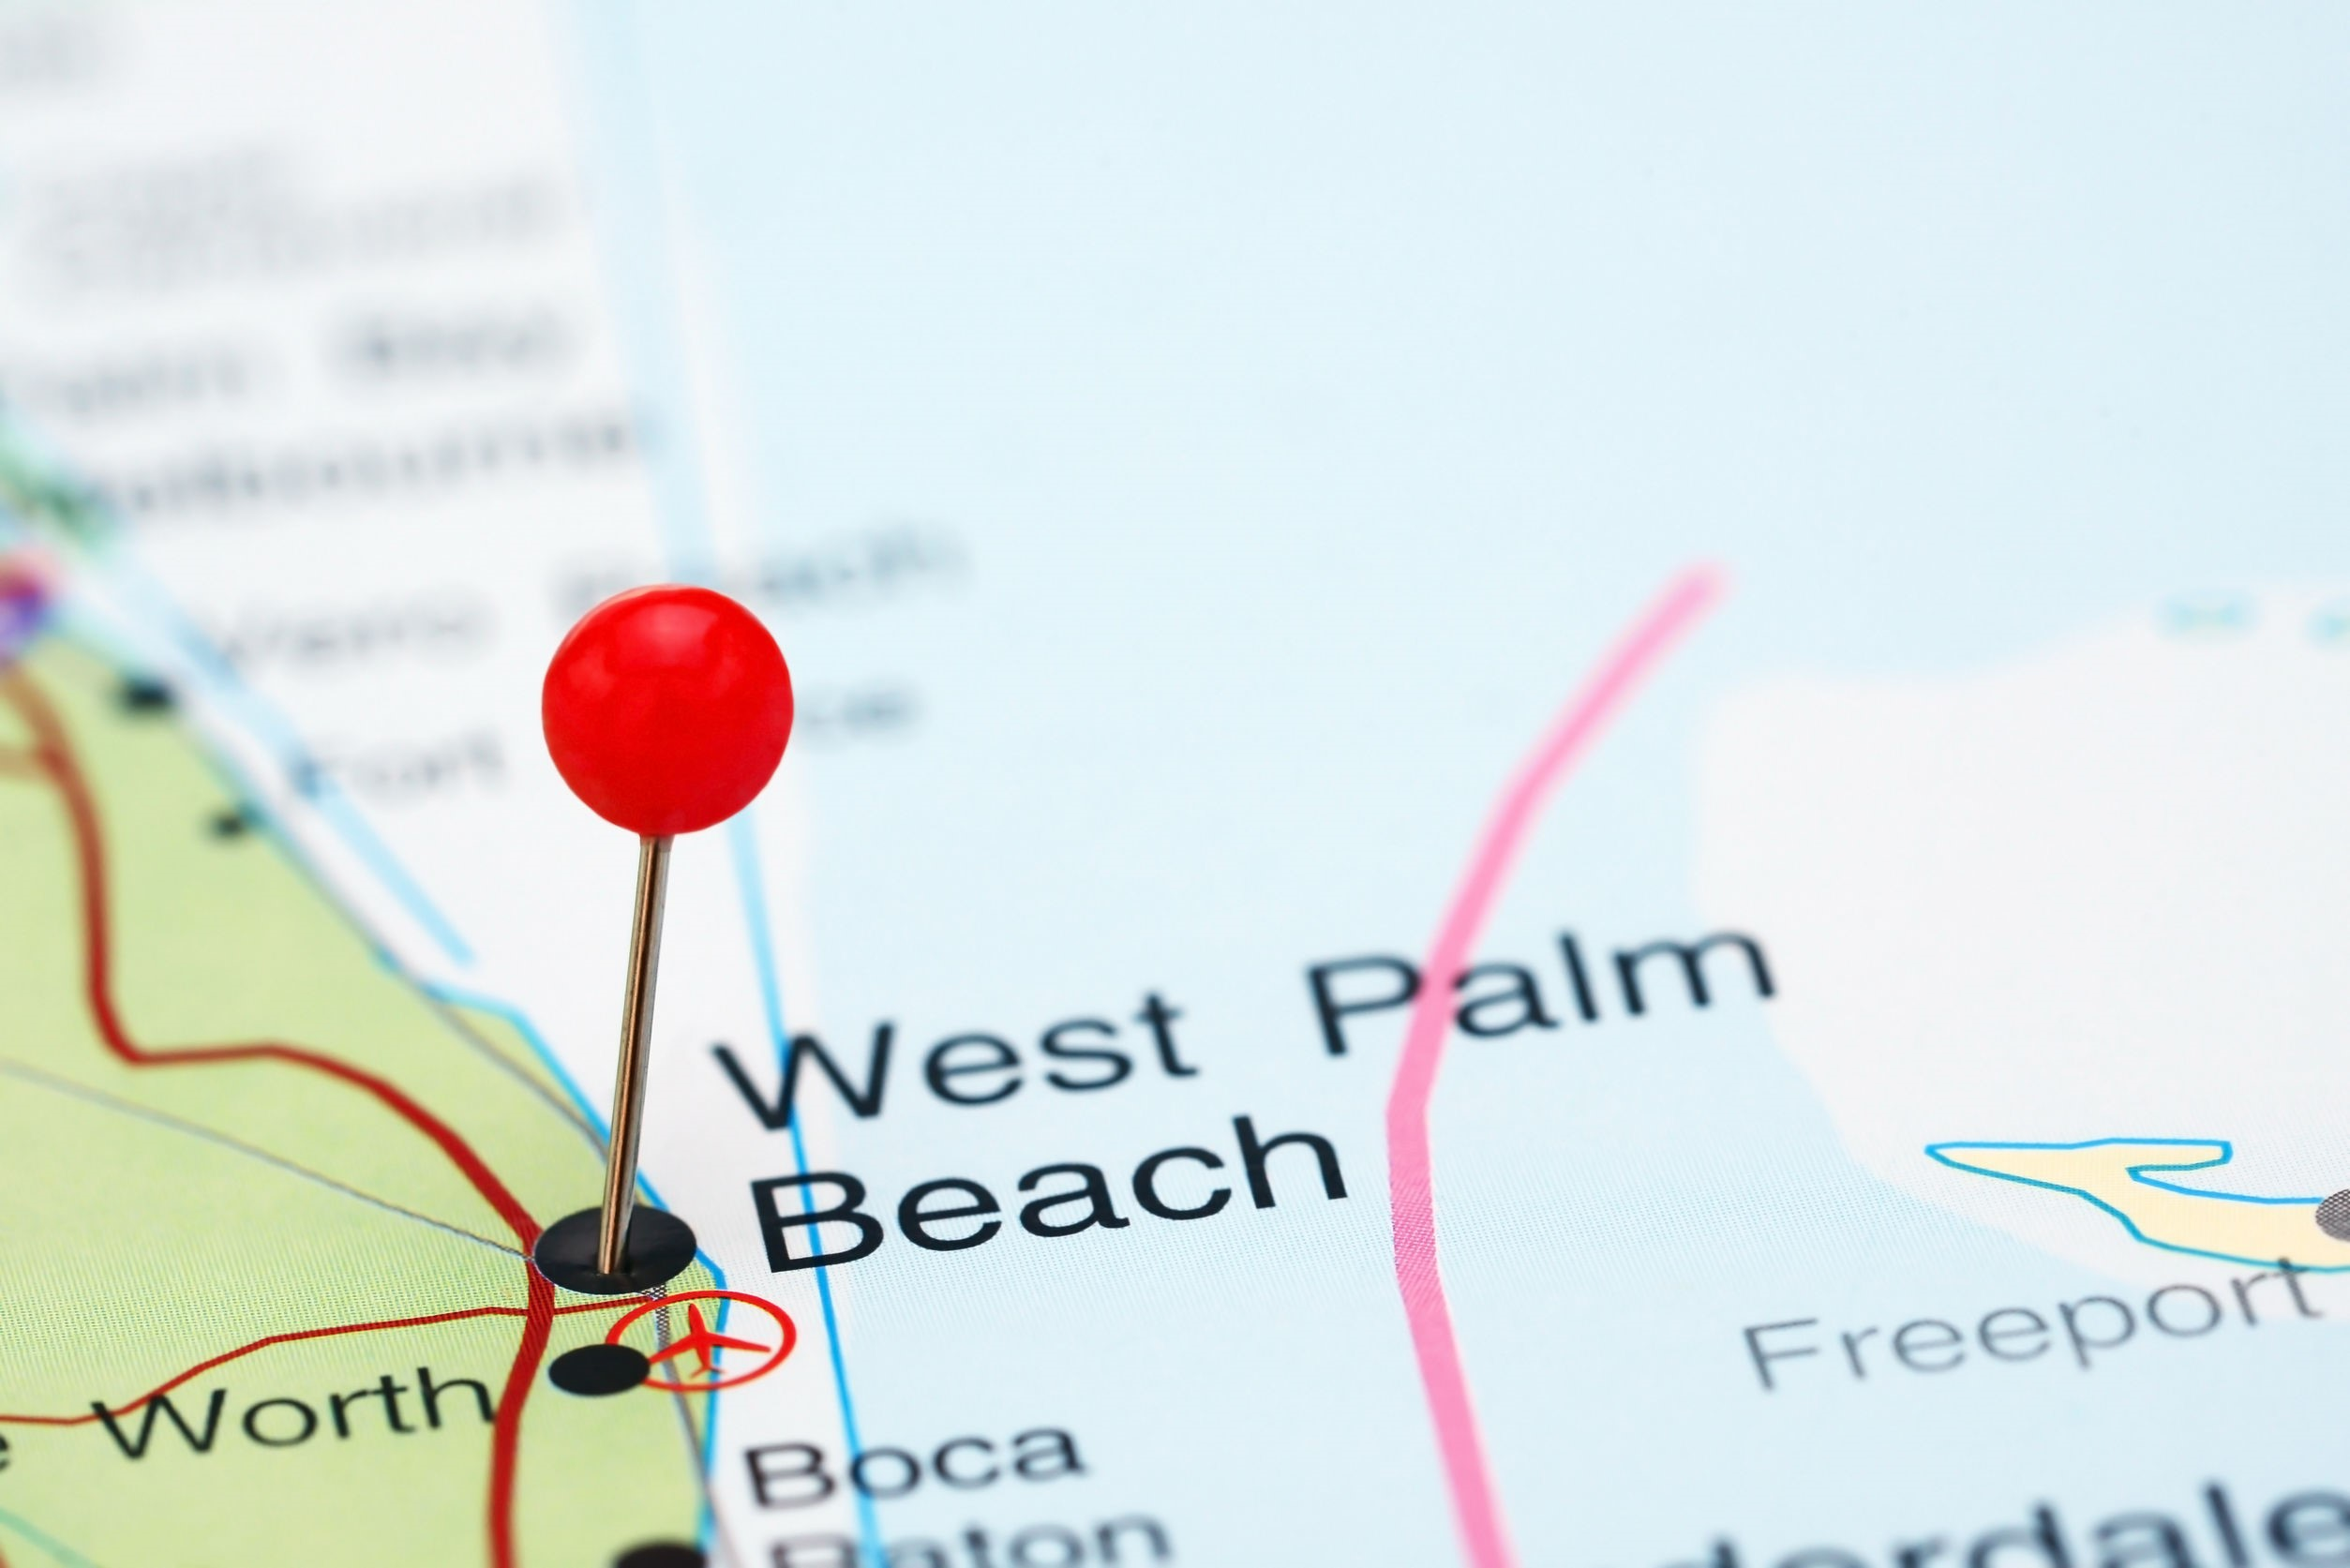 Vioent Crimes Defense Lawyer West Palm Beach